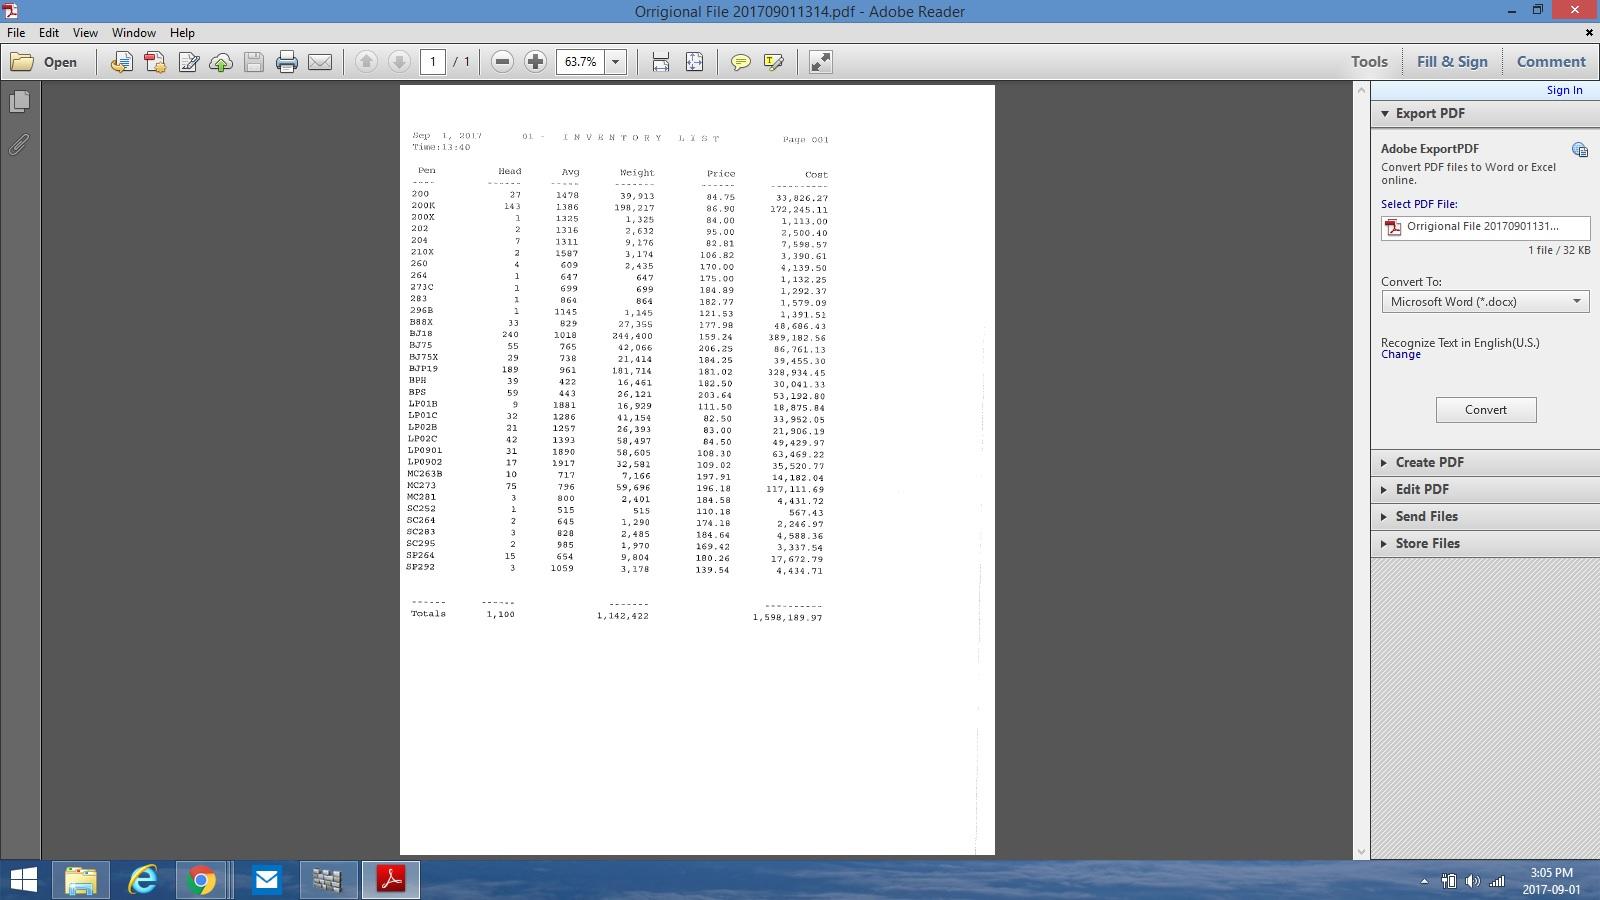 Orriginal File Picture.jpg